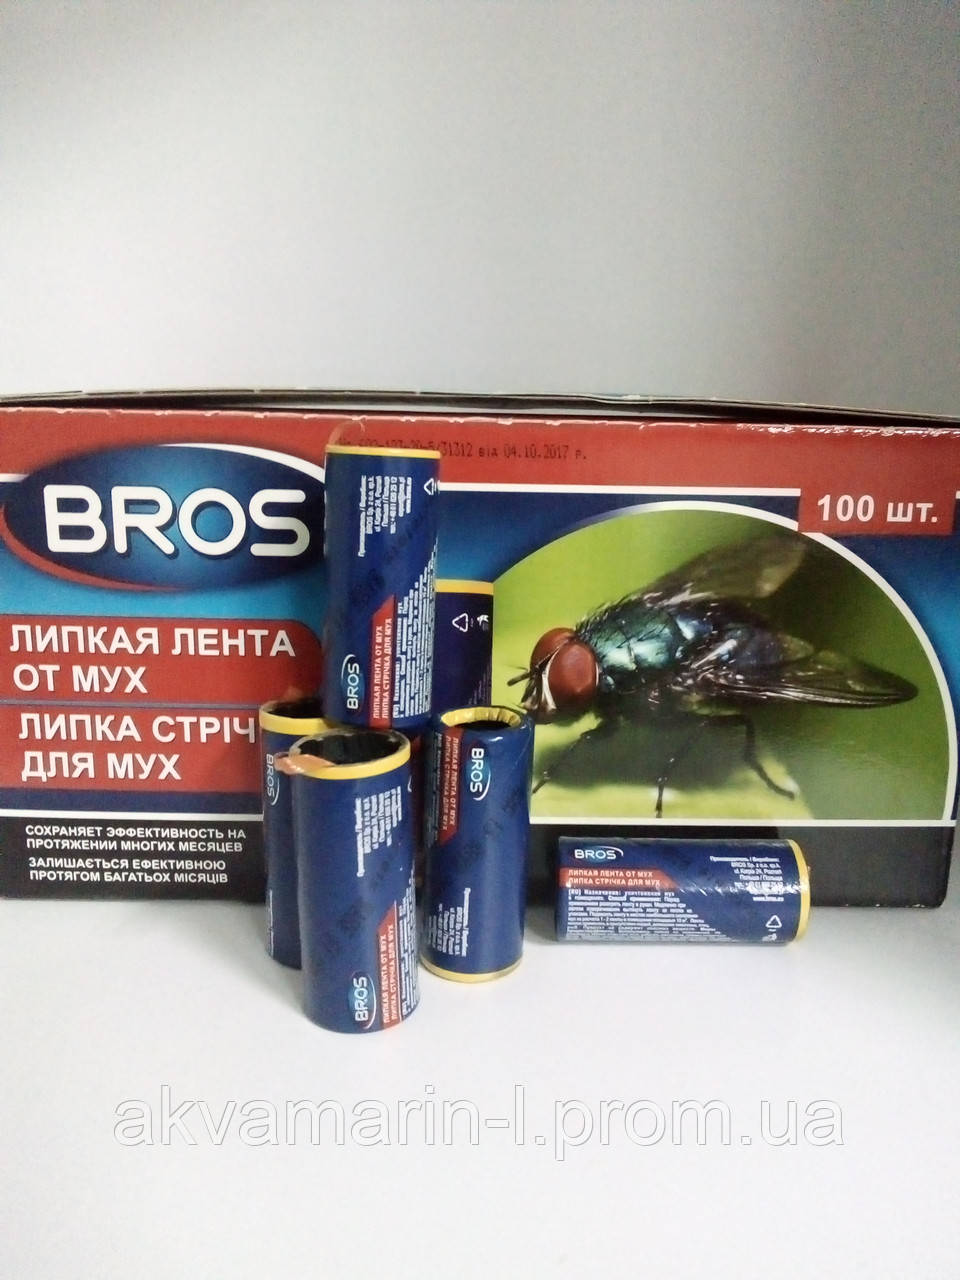 Липкая лента БРОС (BROS)  от мух 100 шт